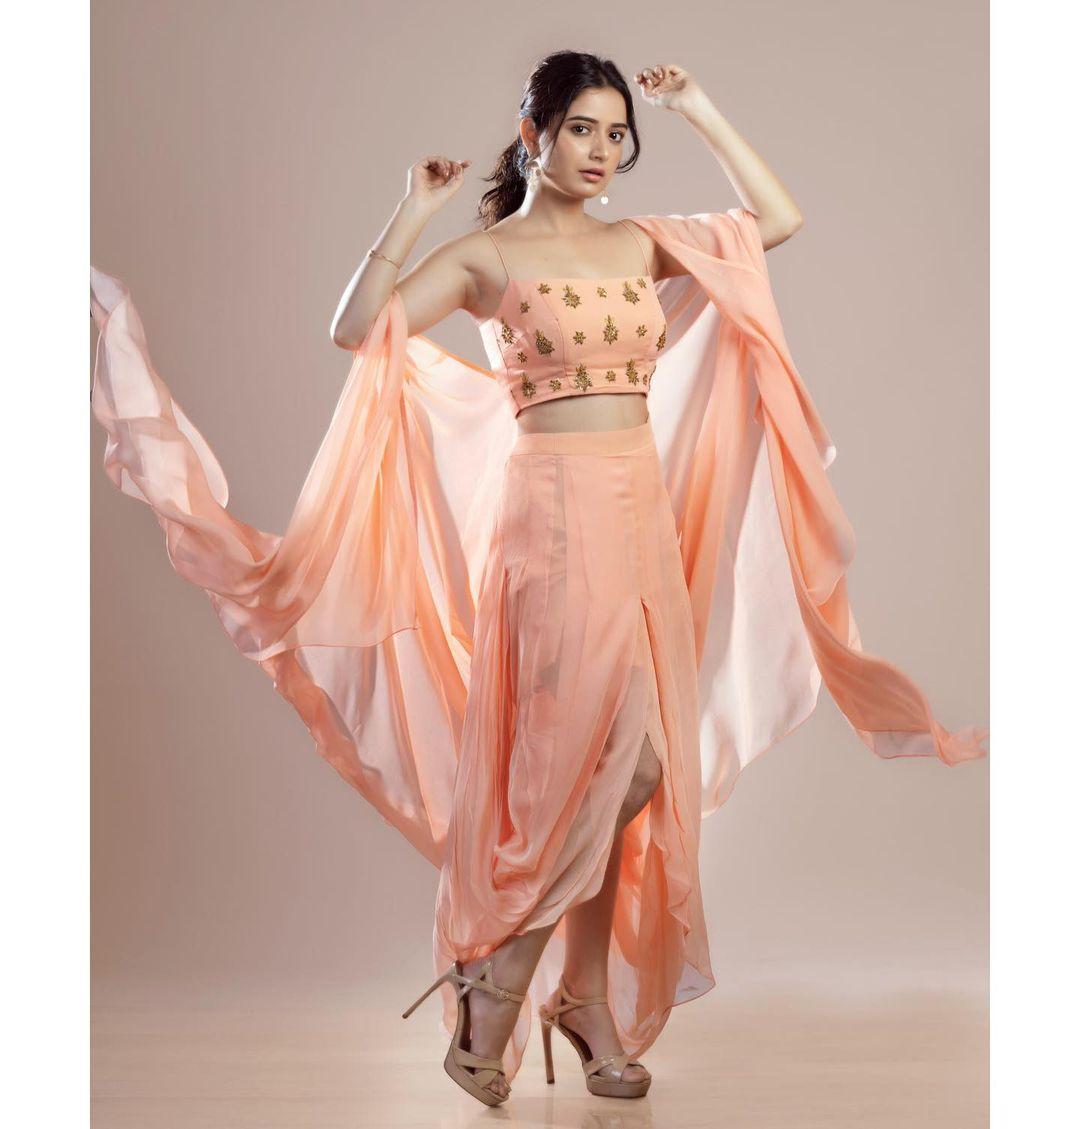 Ashika Ranganath Latest Hot Photos and sexy images